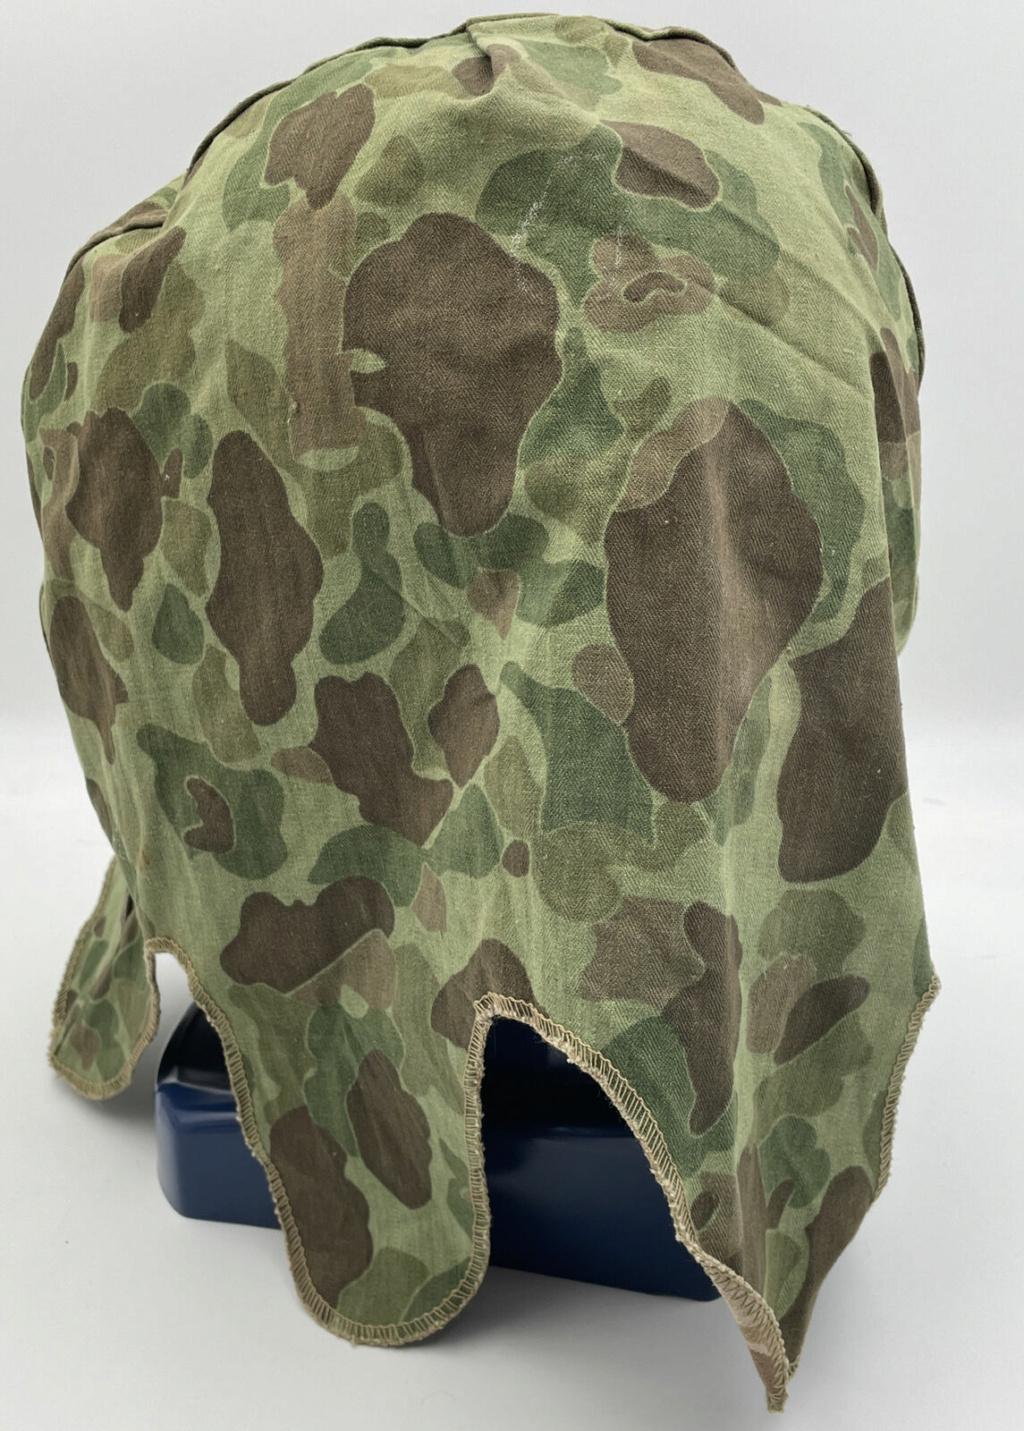 Couvre-casque USMC 538